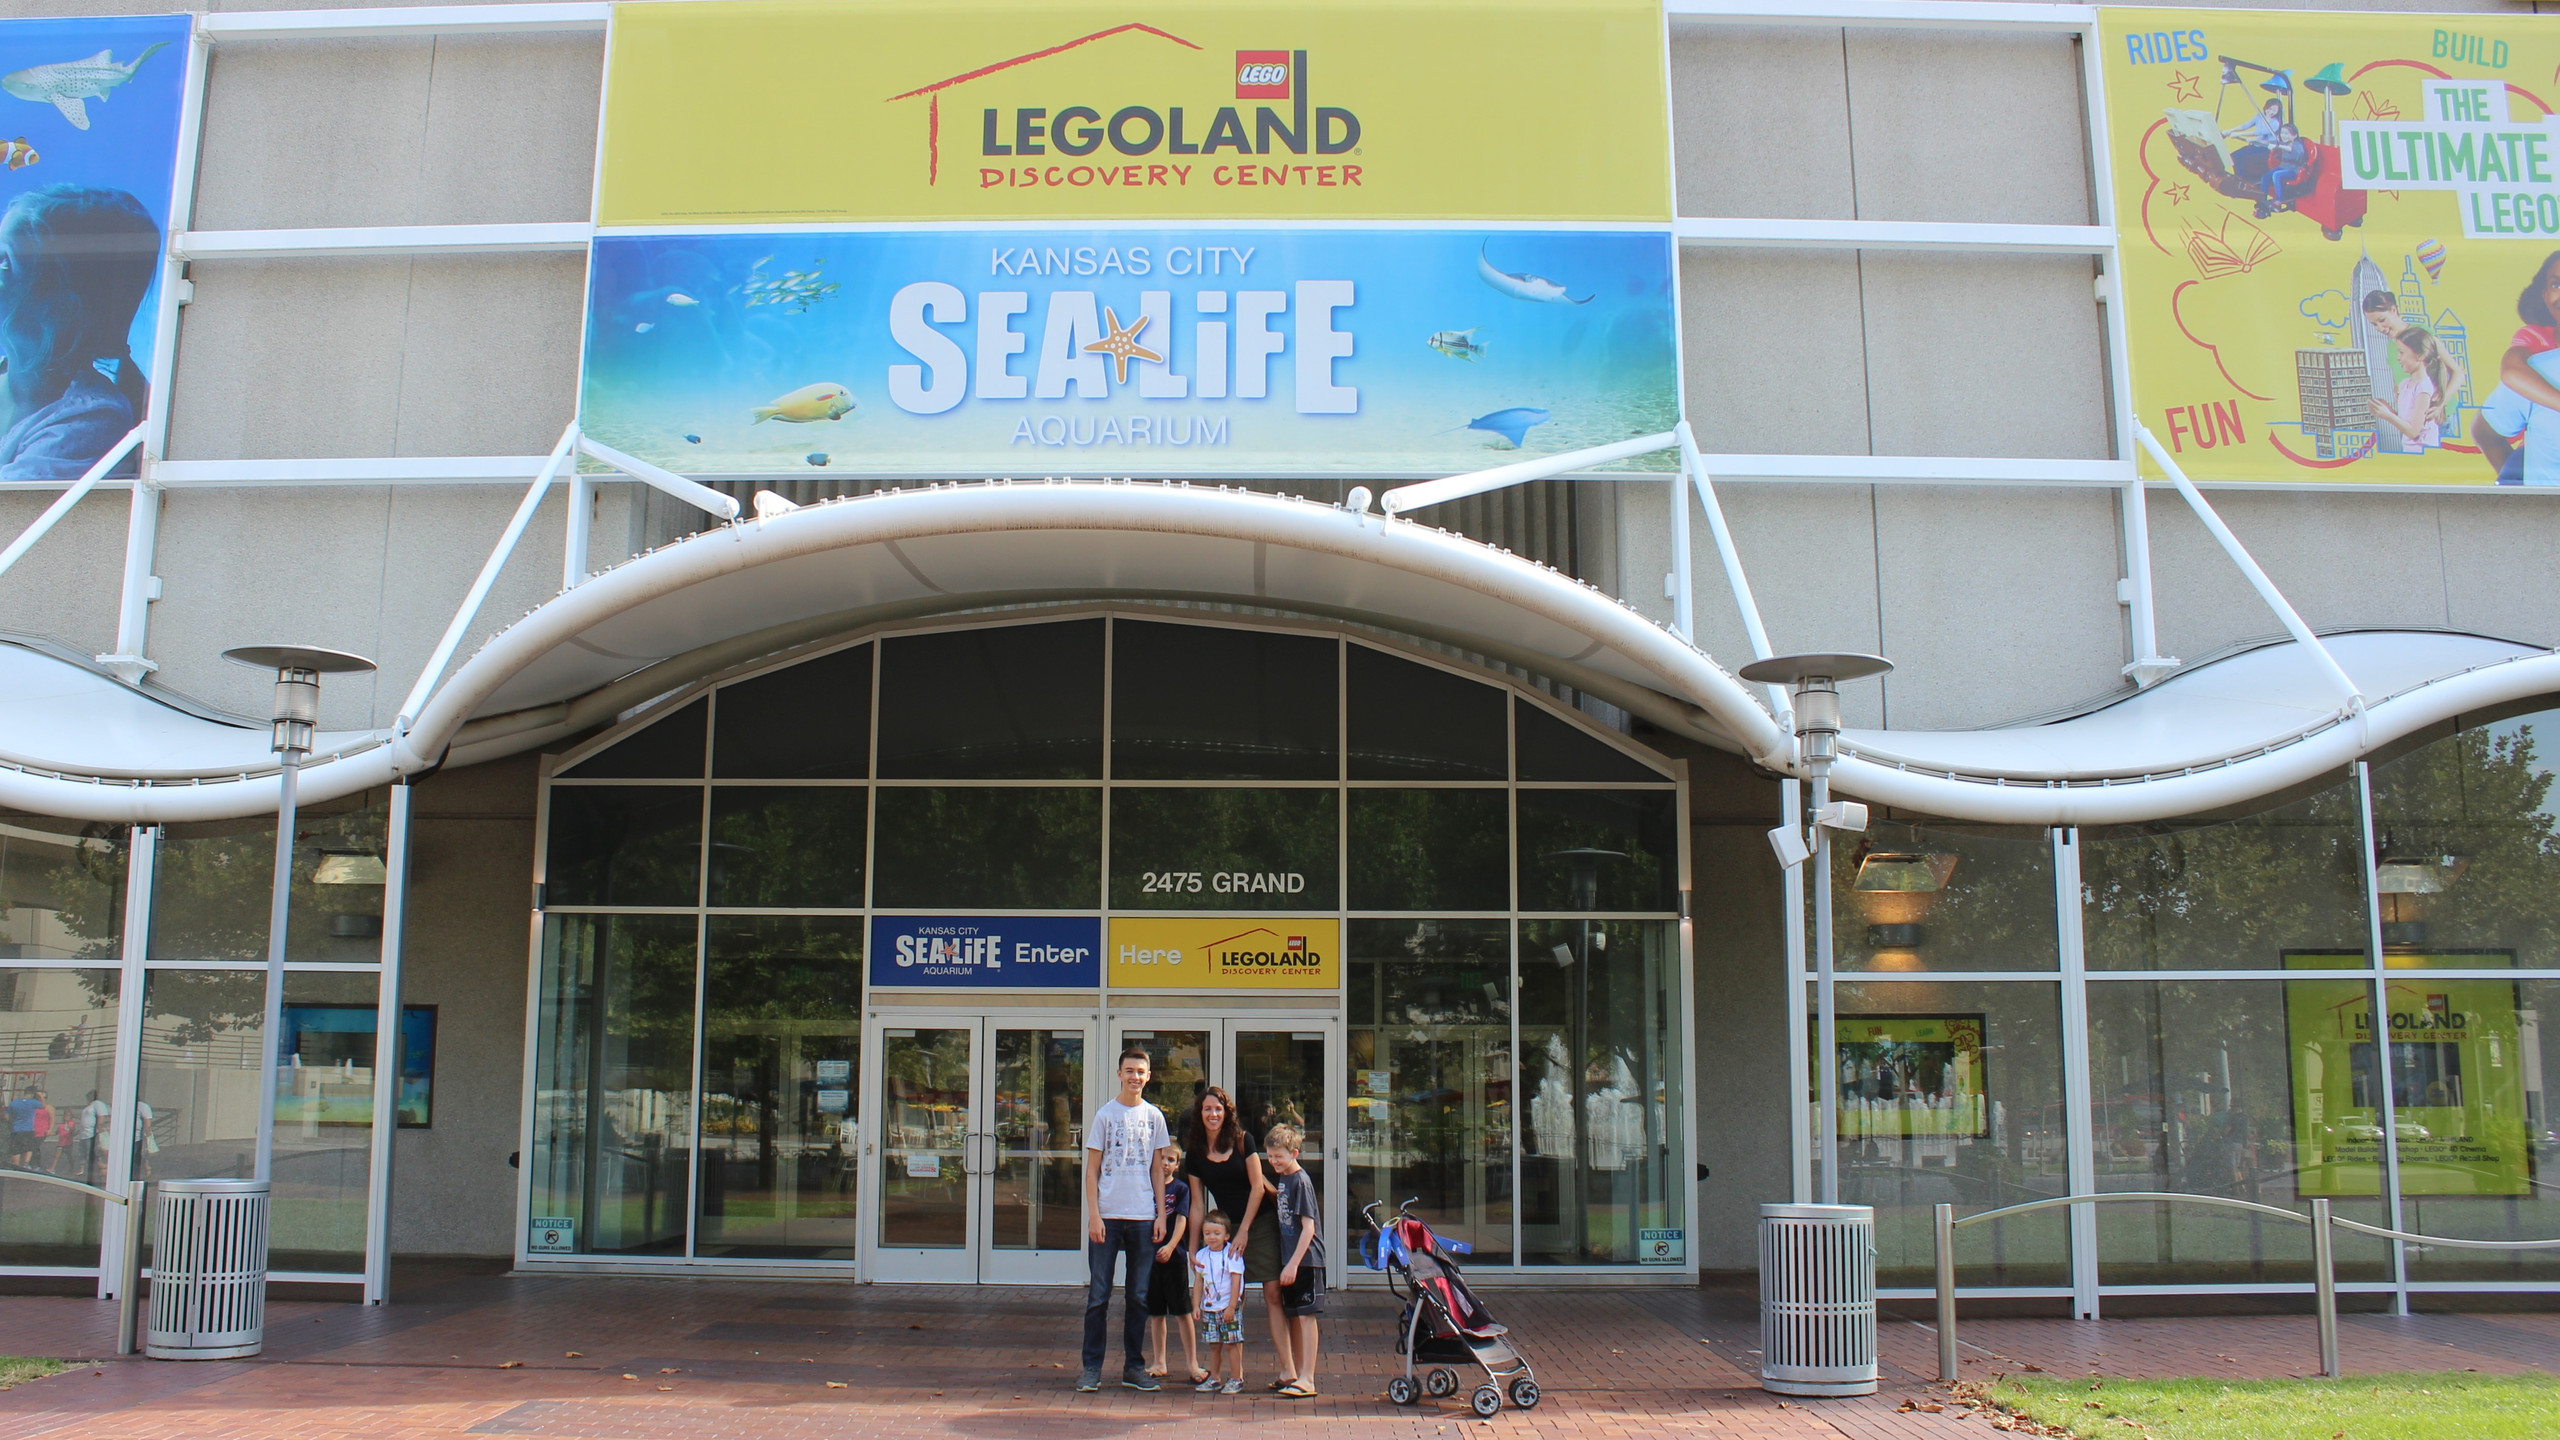 LEGOLAND Discovery Center and Sea Life Aquarium in Kansas City